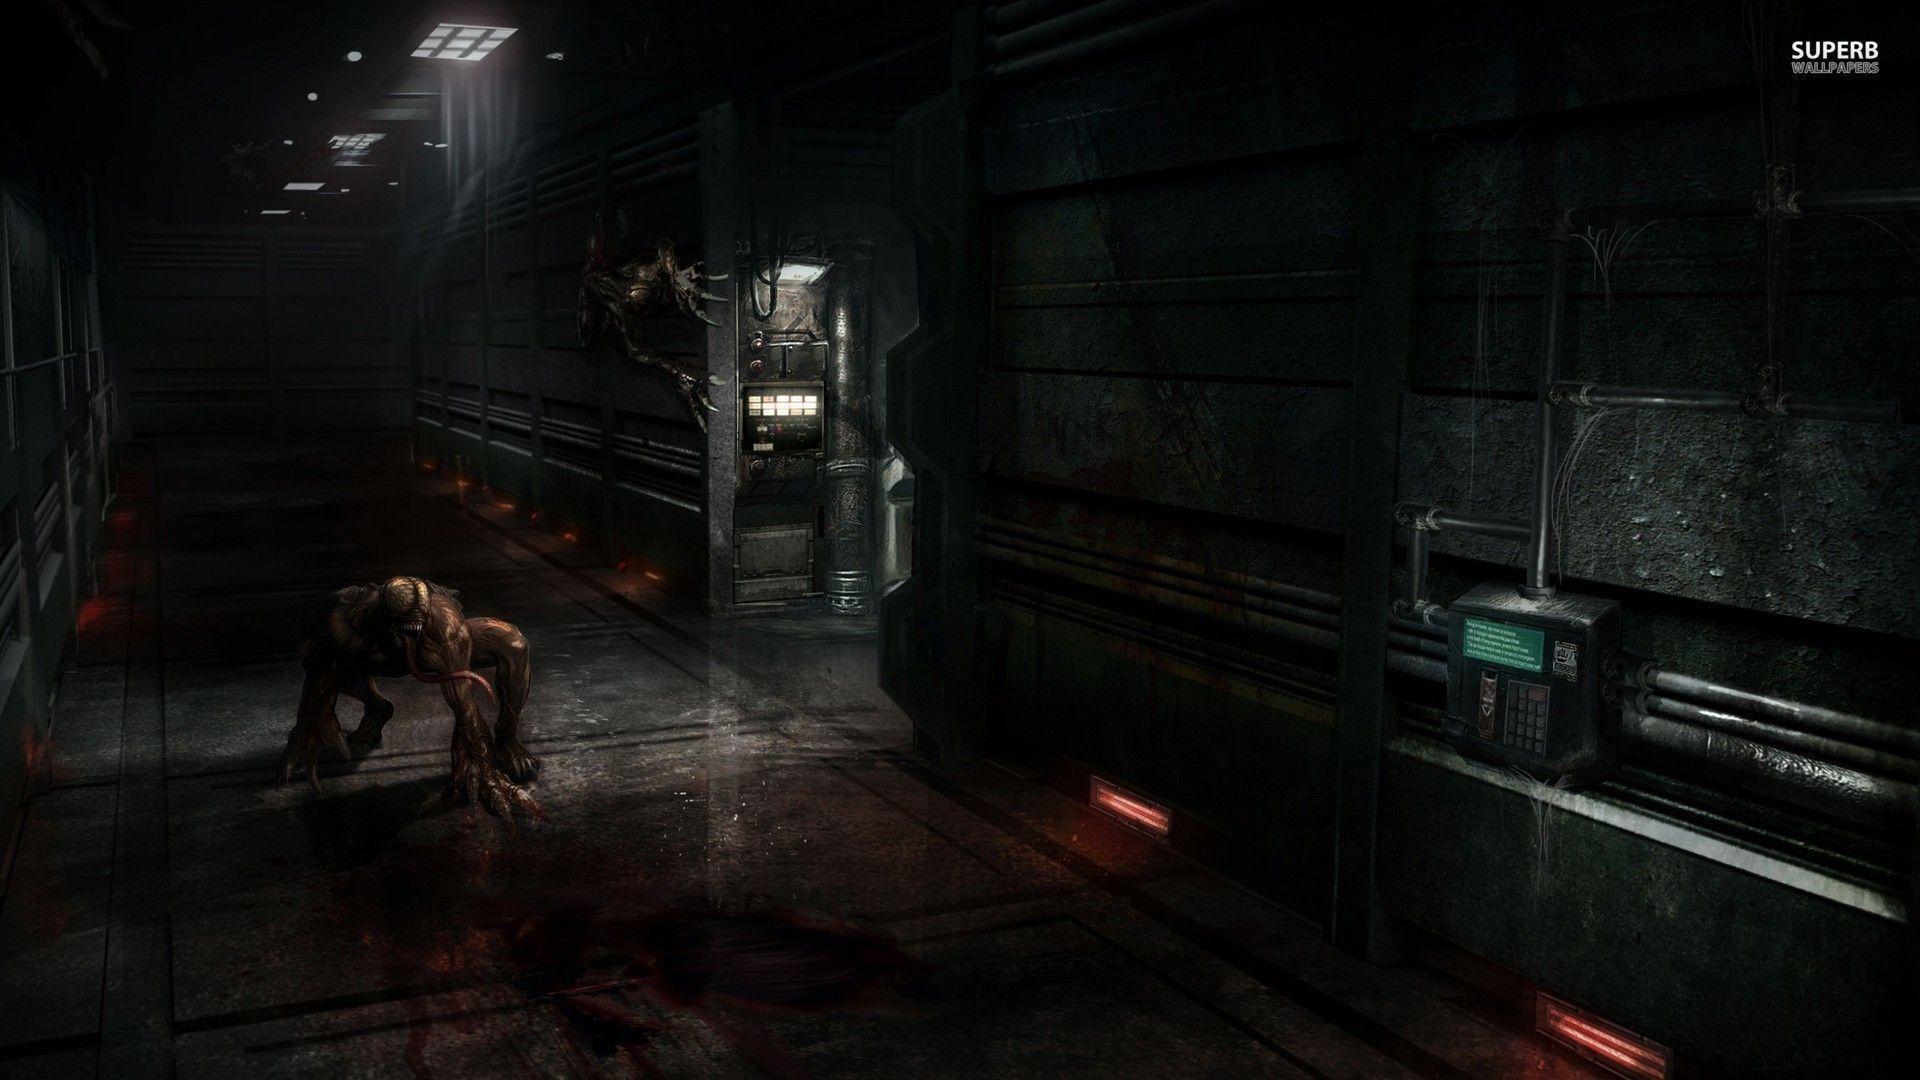 Assassins Creed 2 Wallpaper Hd 1080p Resident Evil 6 Wallpaper 1080p 83 Images